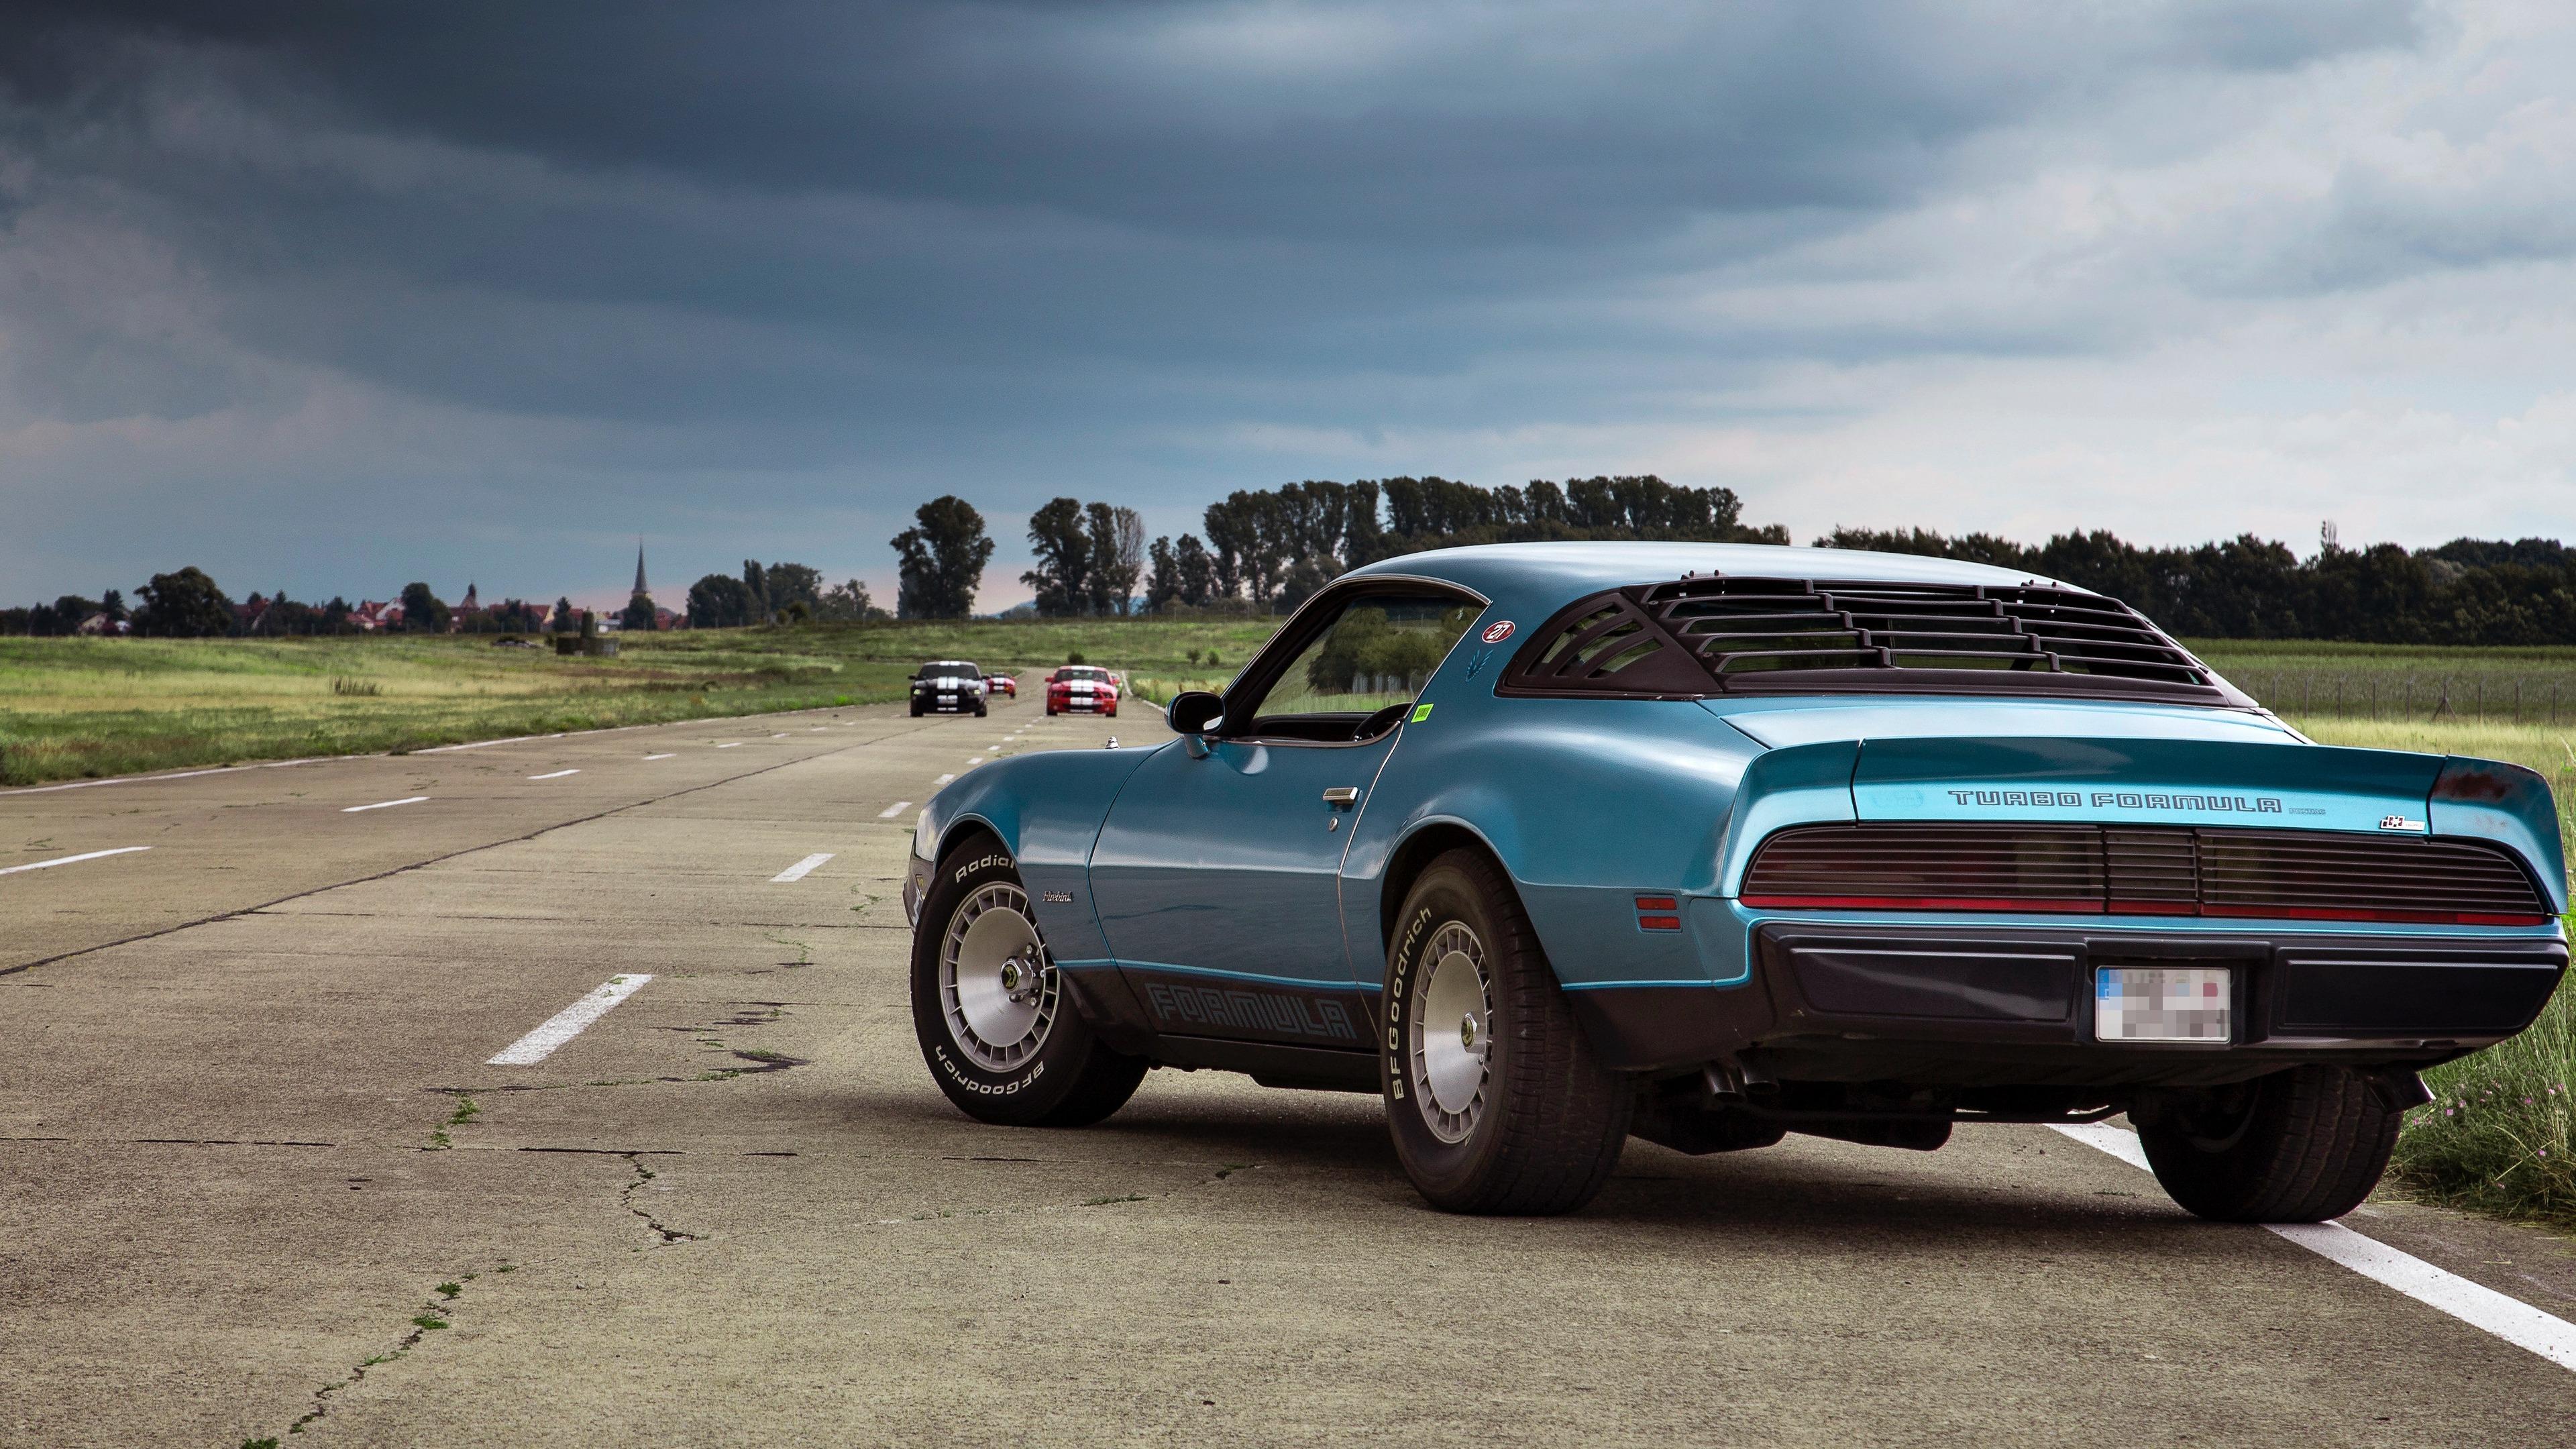 17] Muscle Cars 4K Wallpapers on WallpaperSafari 3840x2160